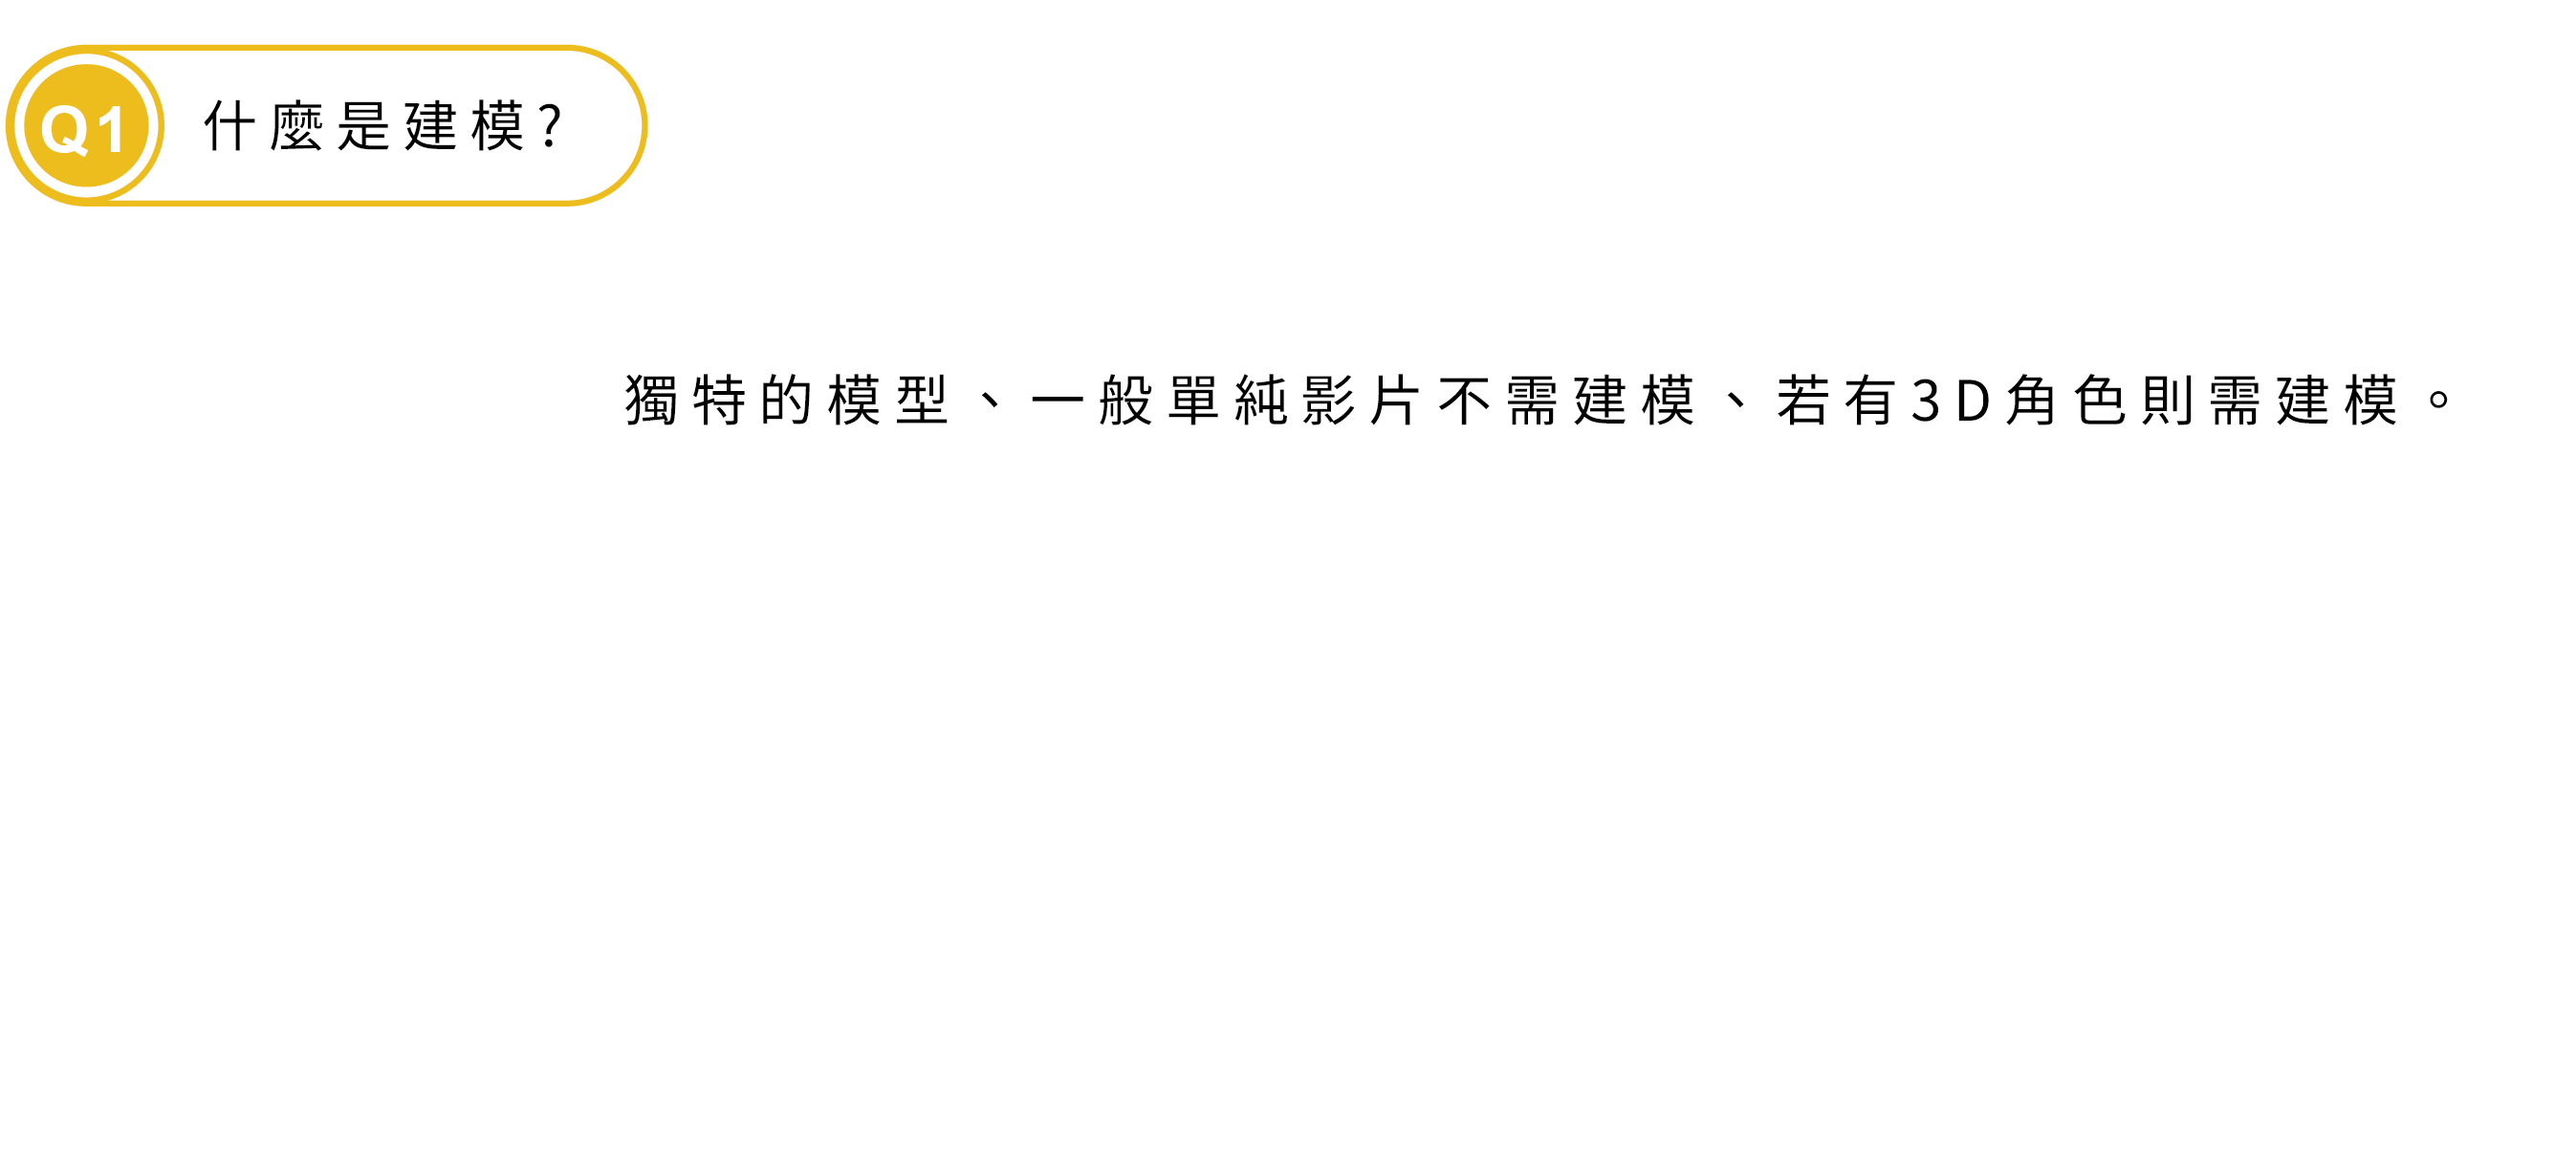 Q1-12 (2)